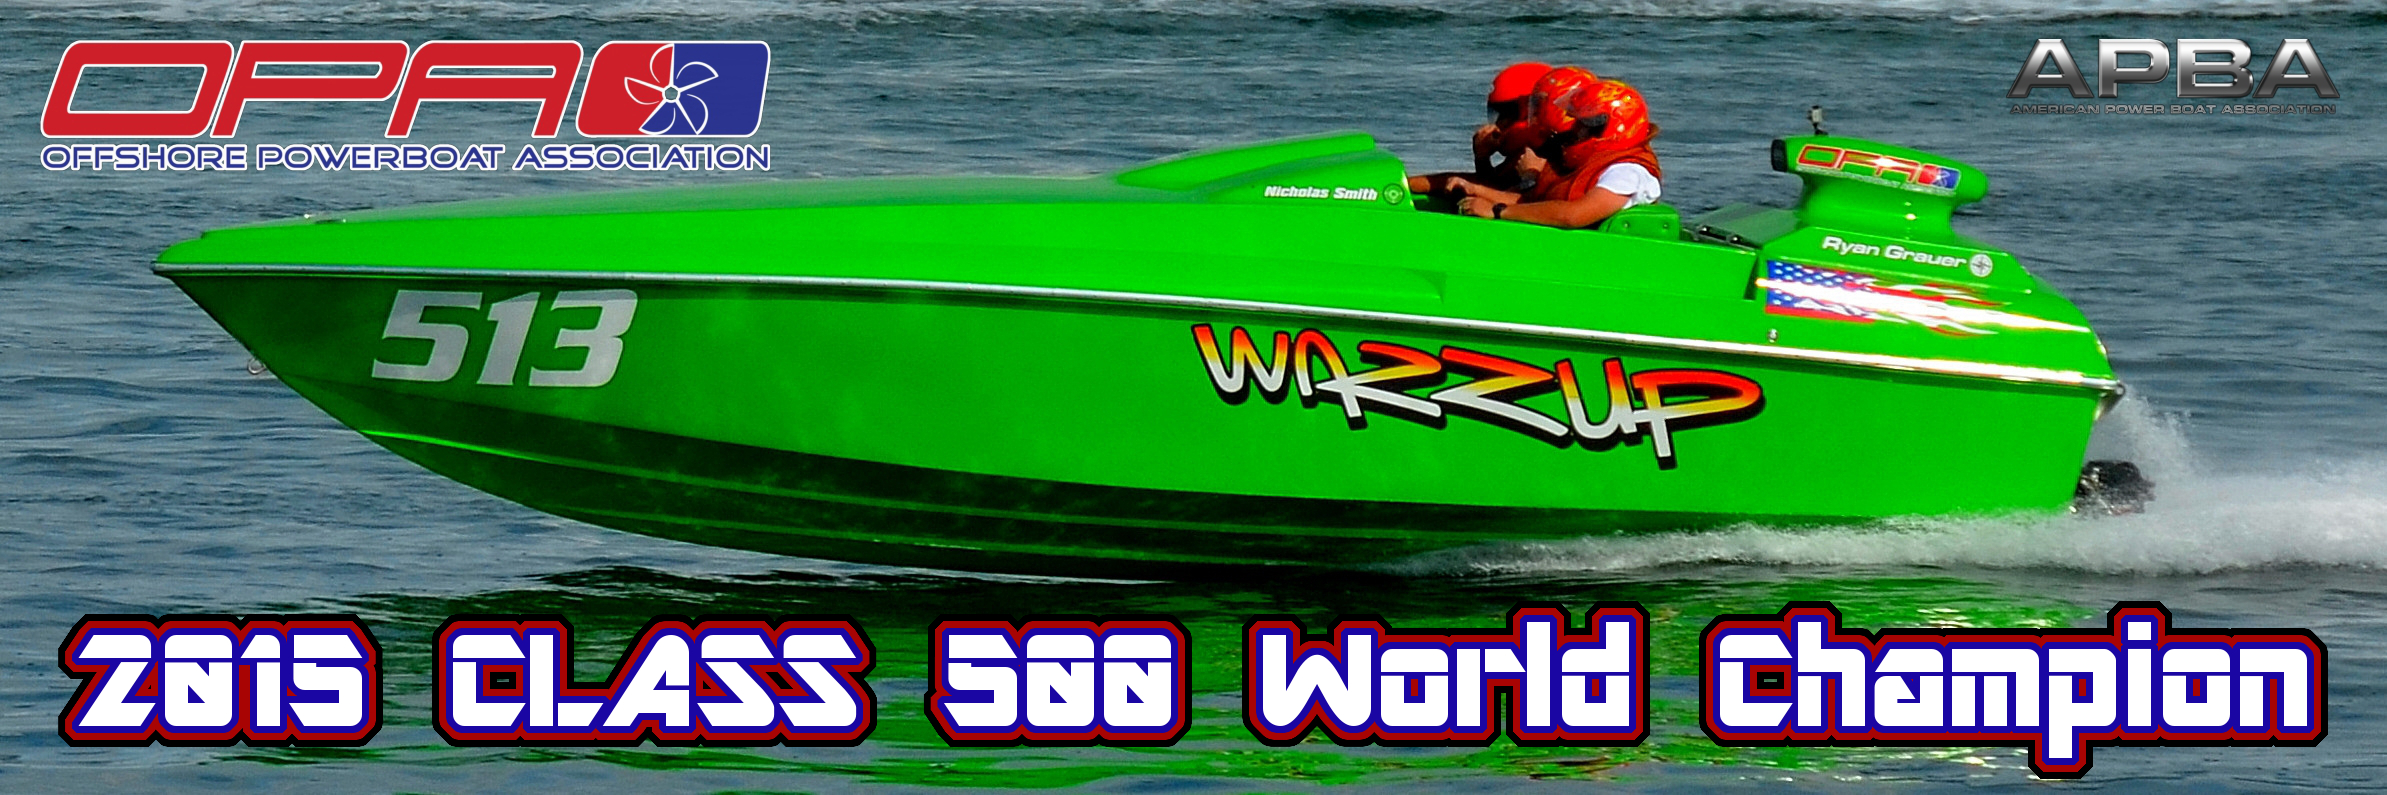 2015 WC Class 500.jpg